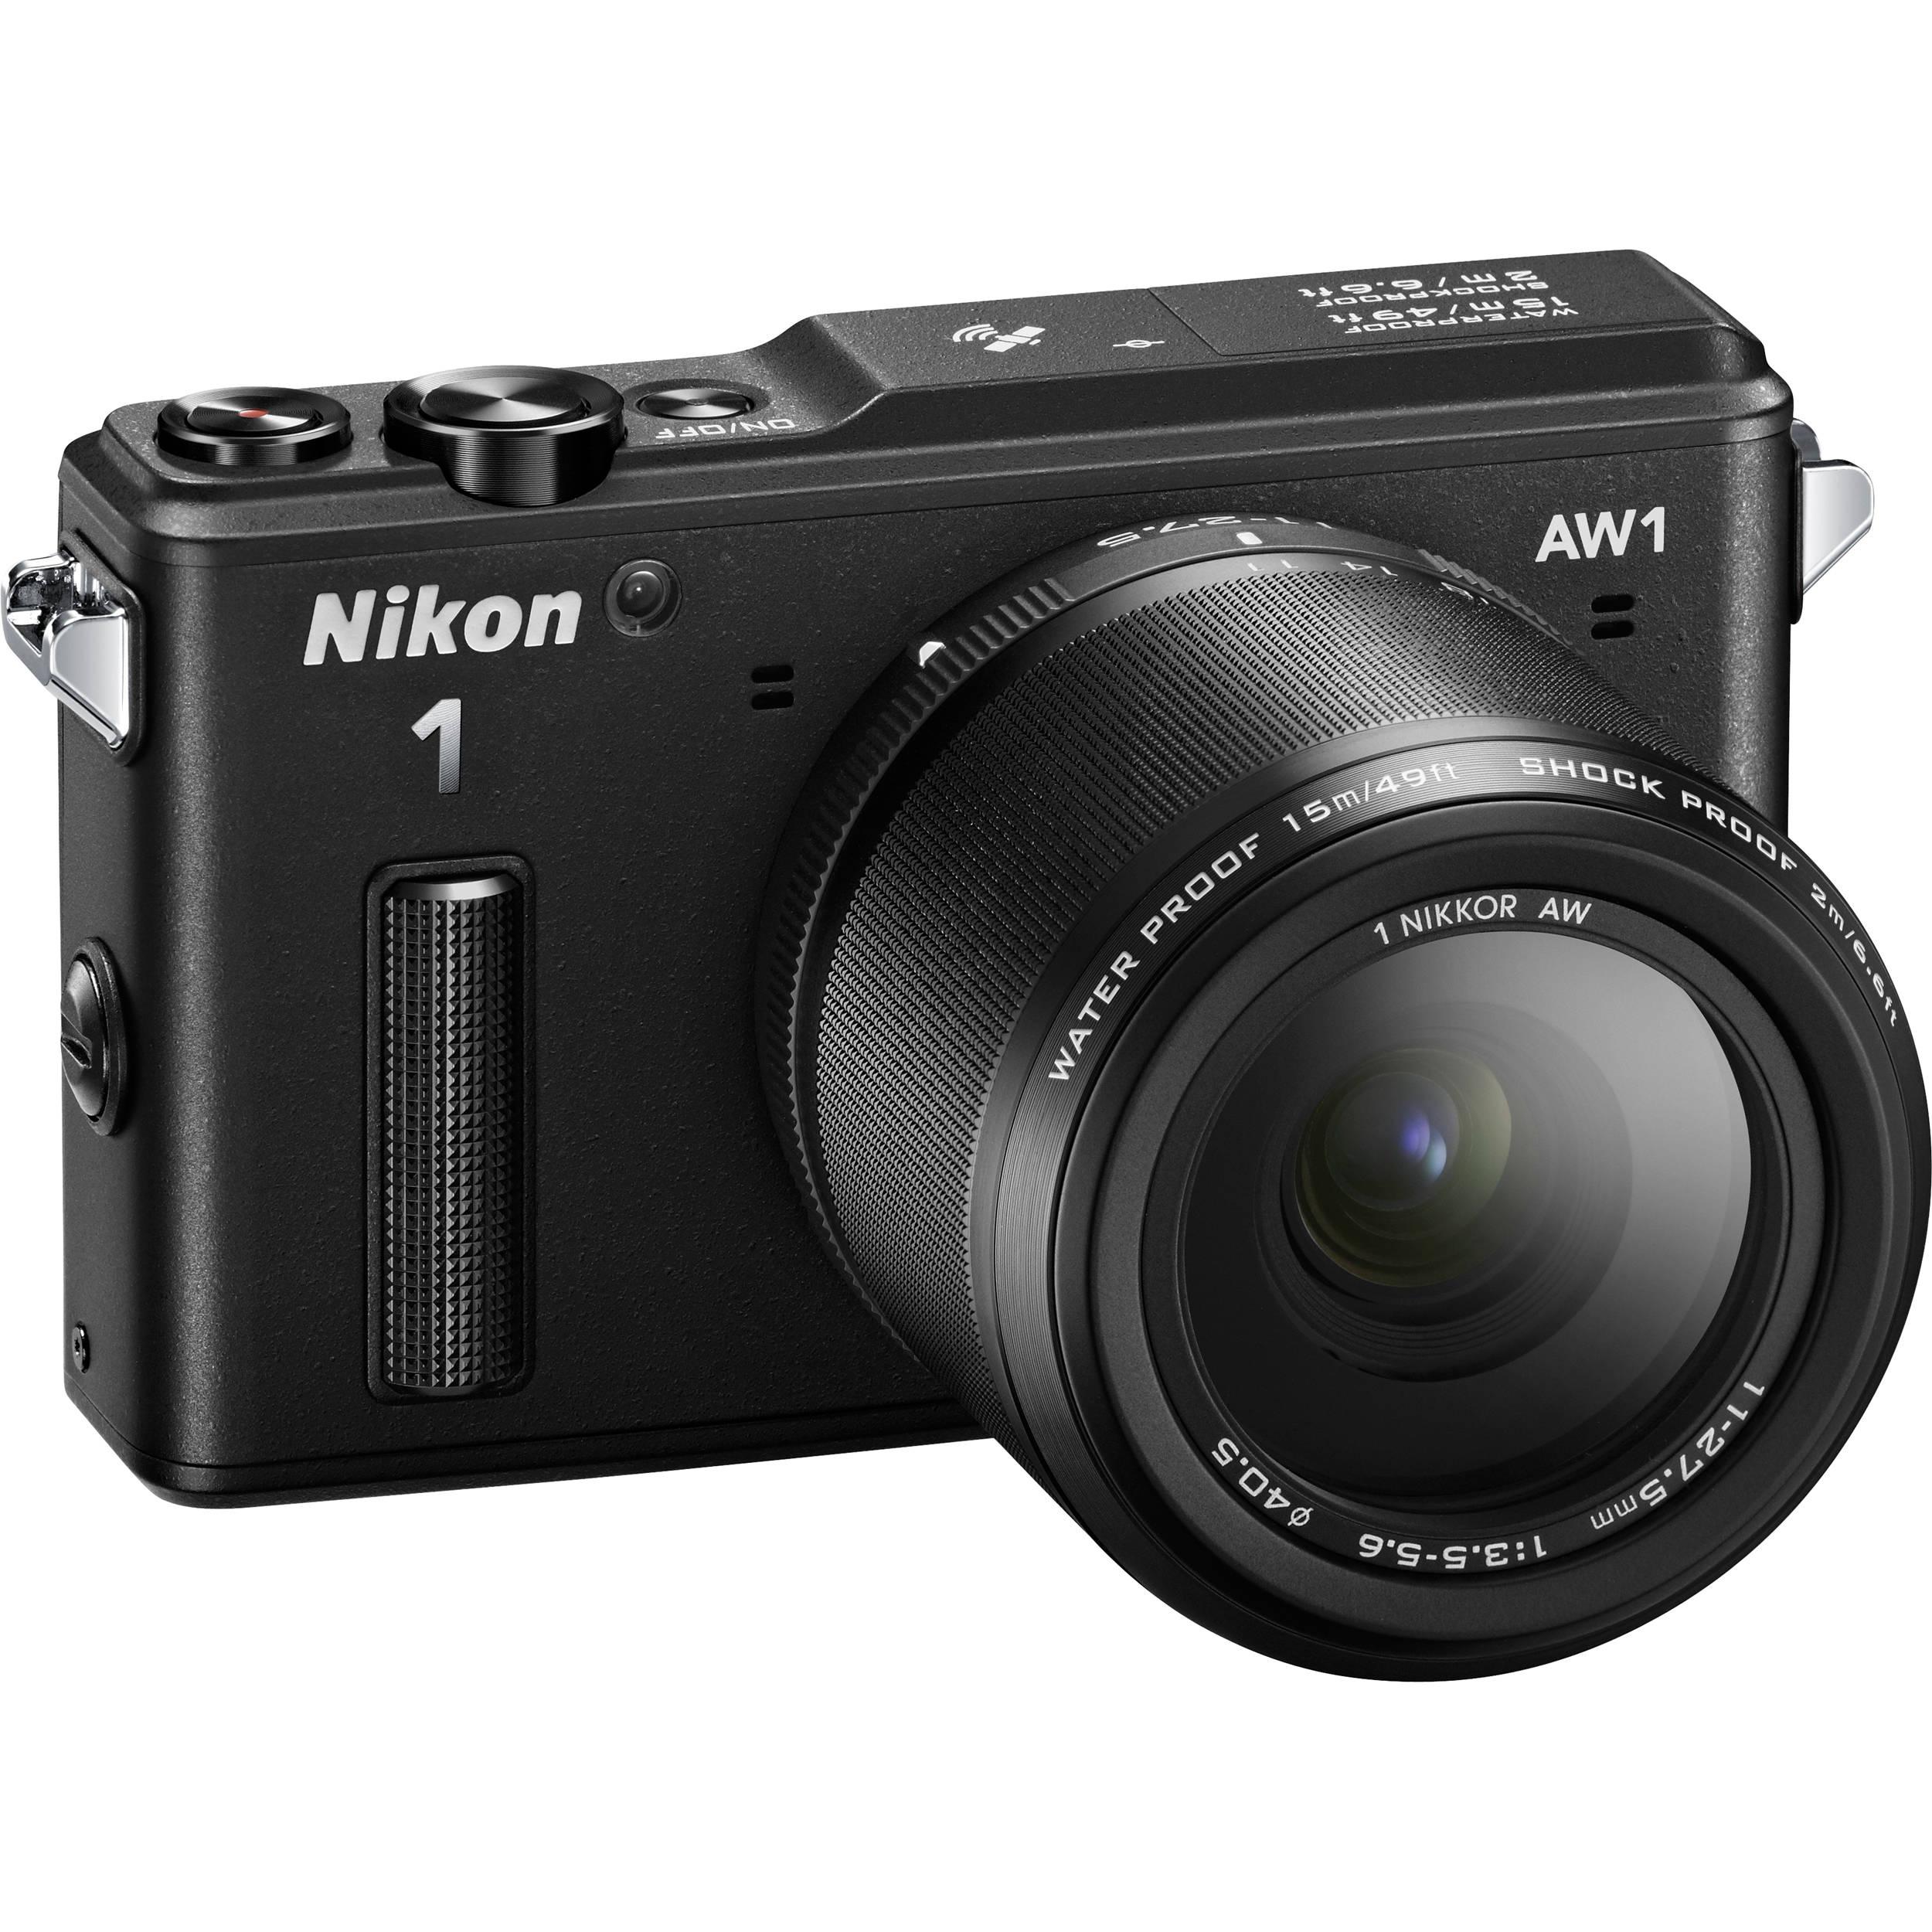 Nikon 1 aw1 user manual.